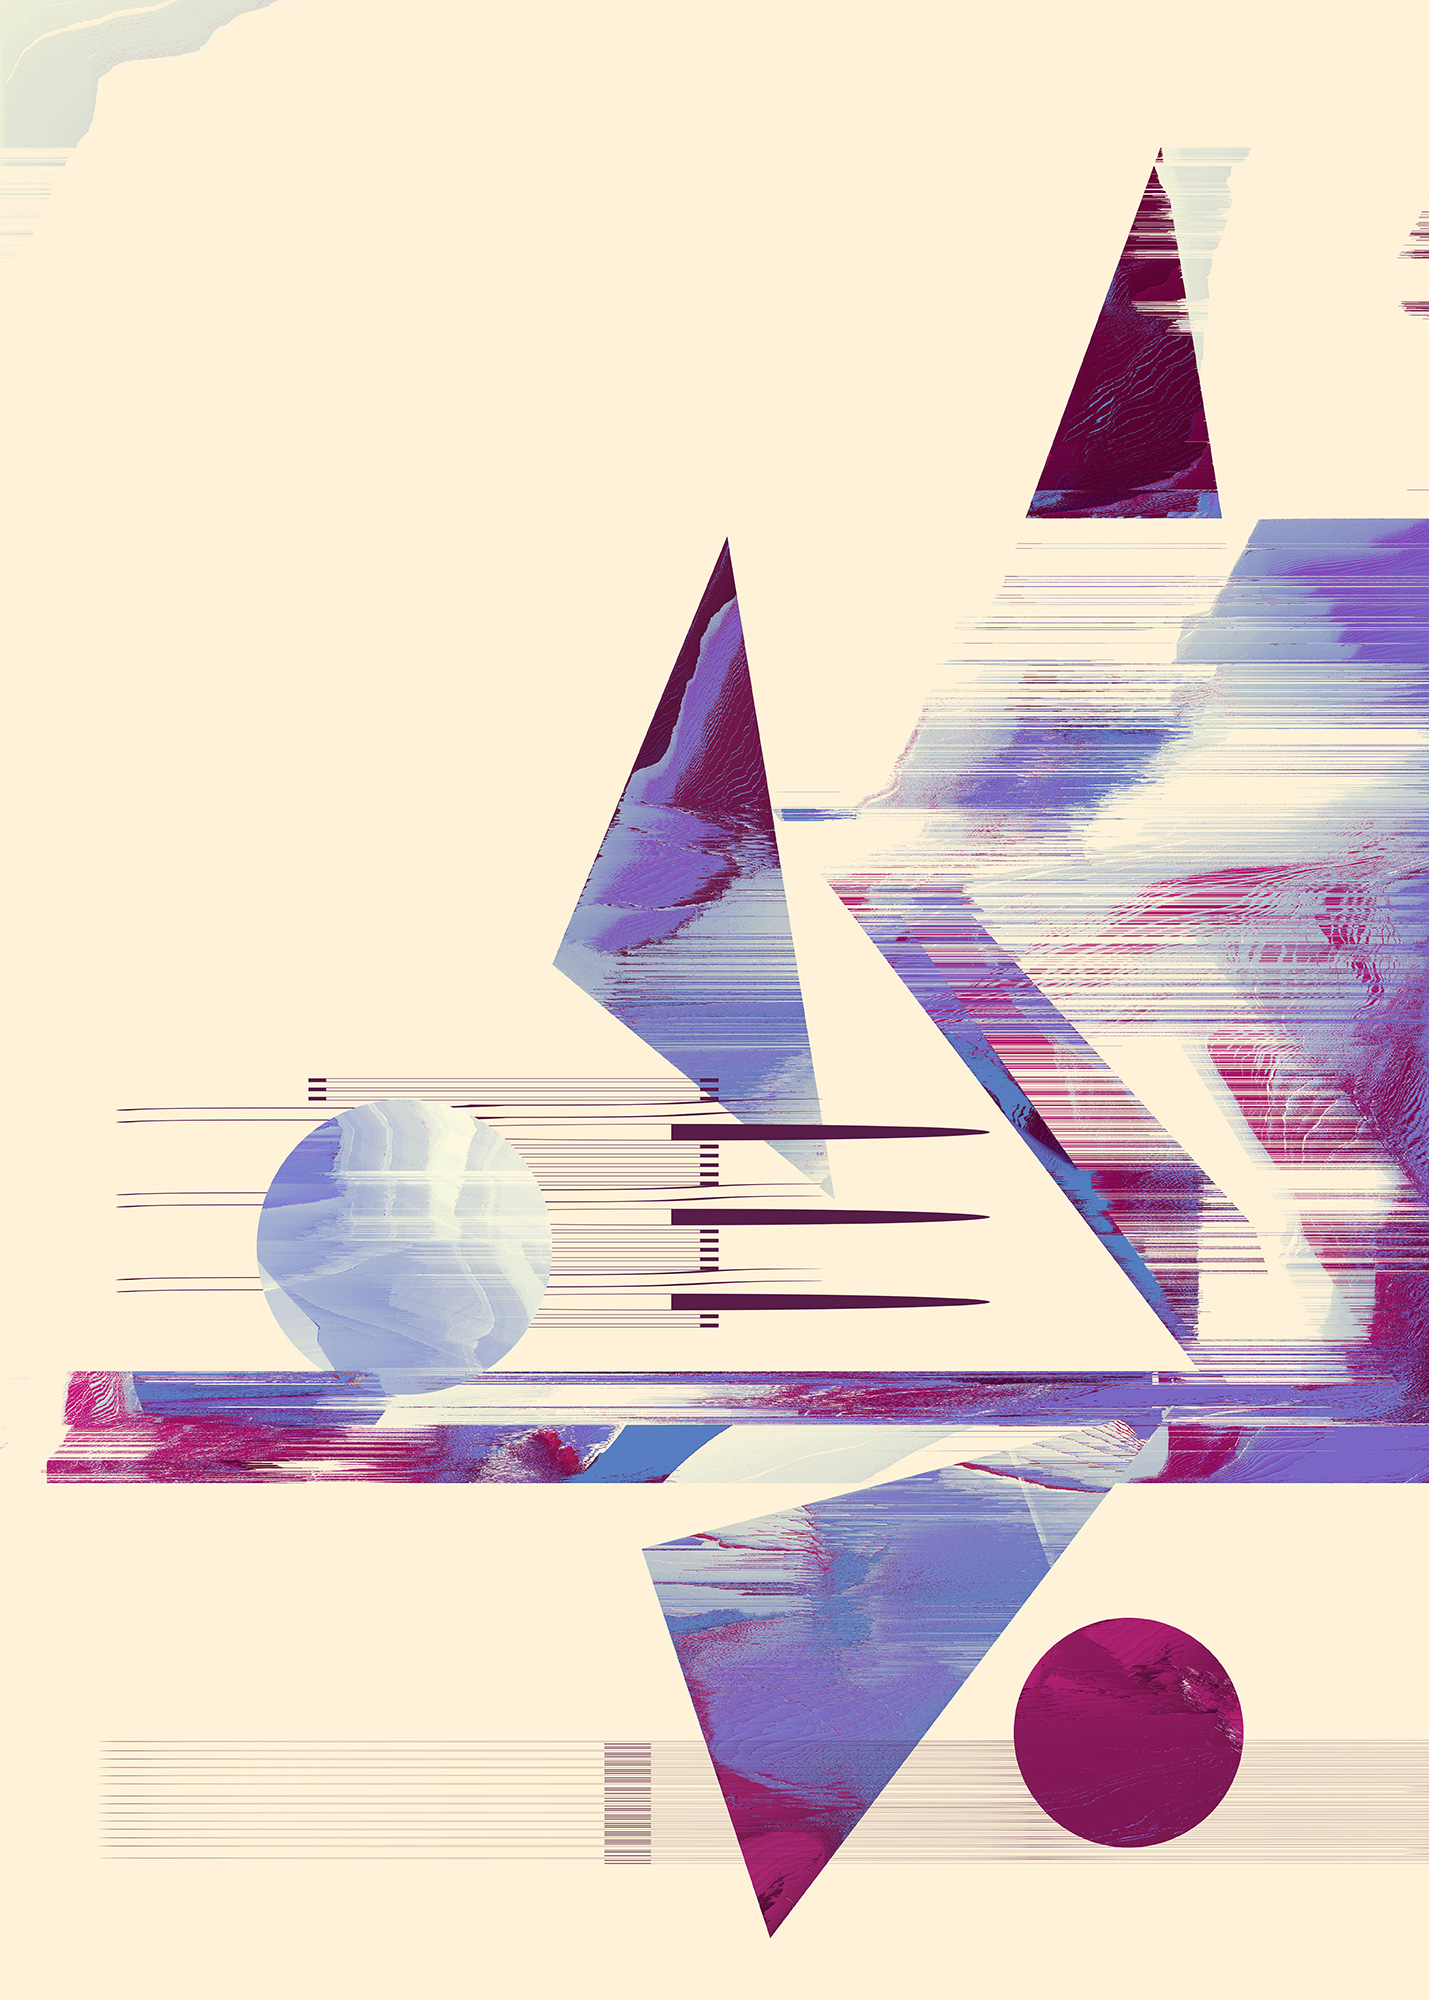 Ewa Doroszenko – Composition with the Sun online 09, obraz